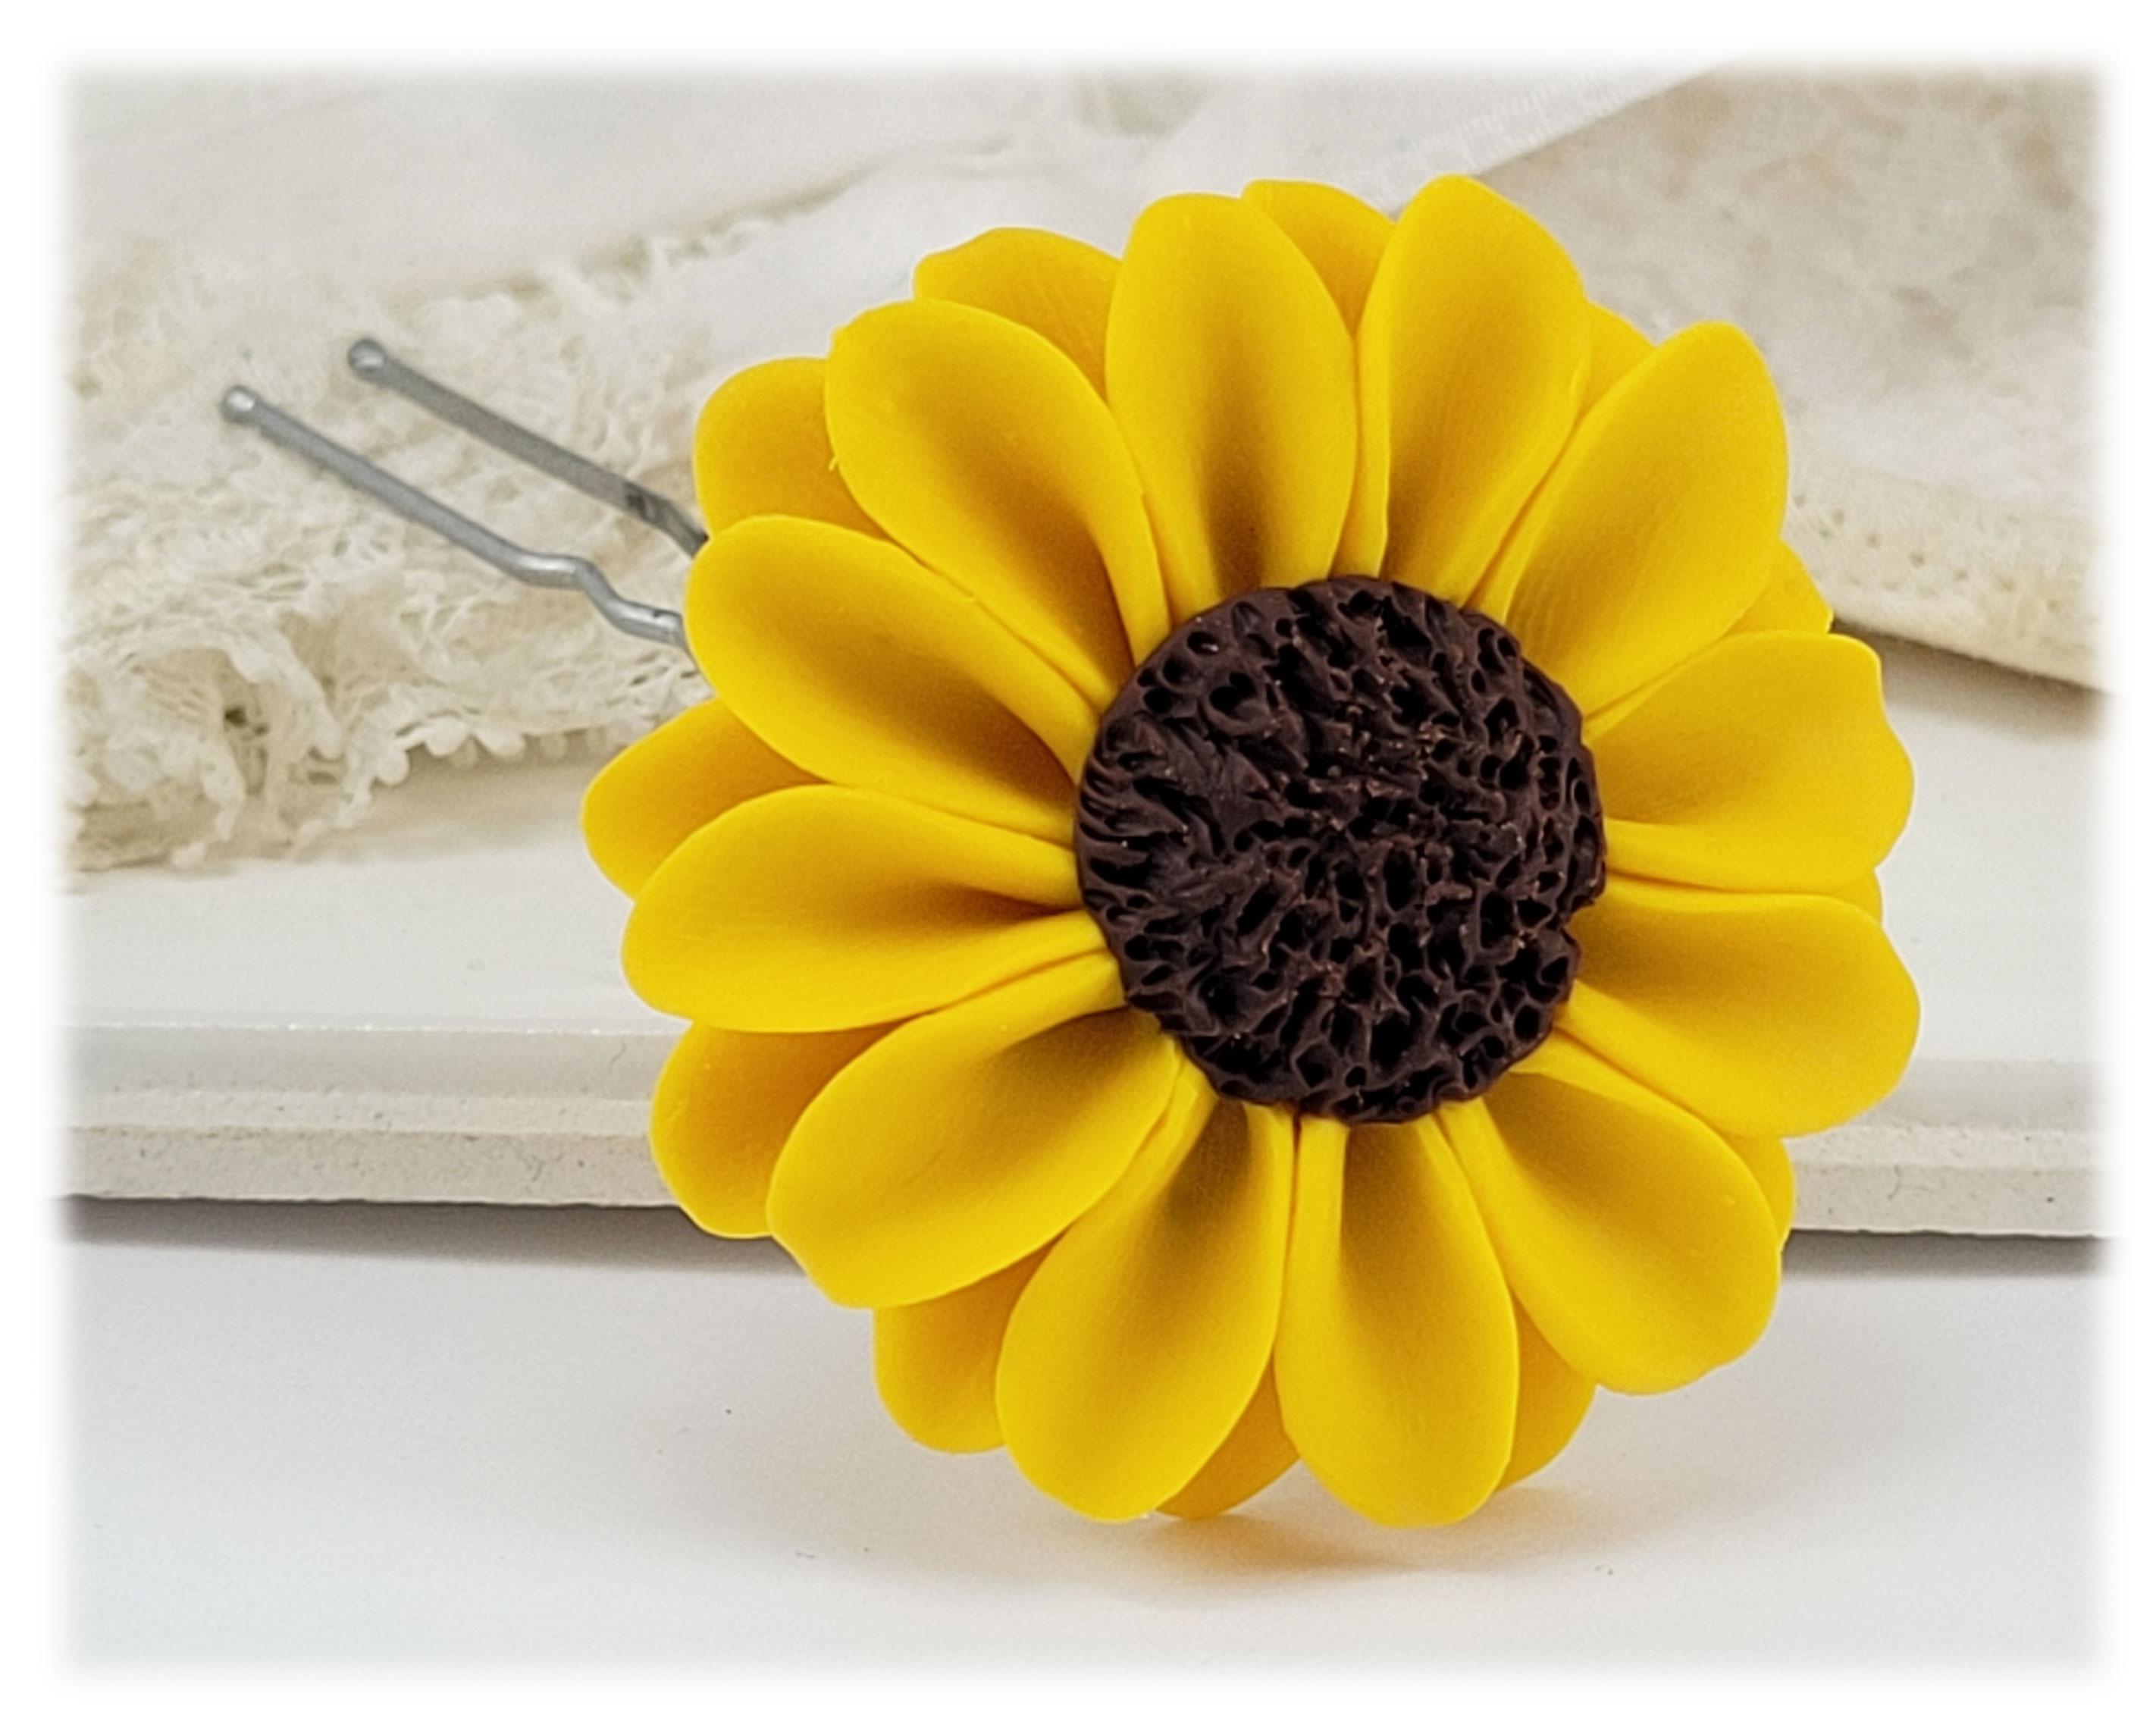 Sunflower jewelry a collection of handmade sunflower designs mightylinksfo